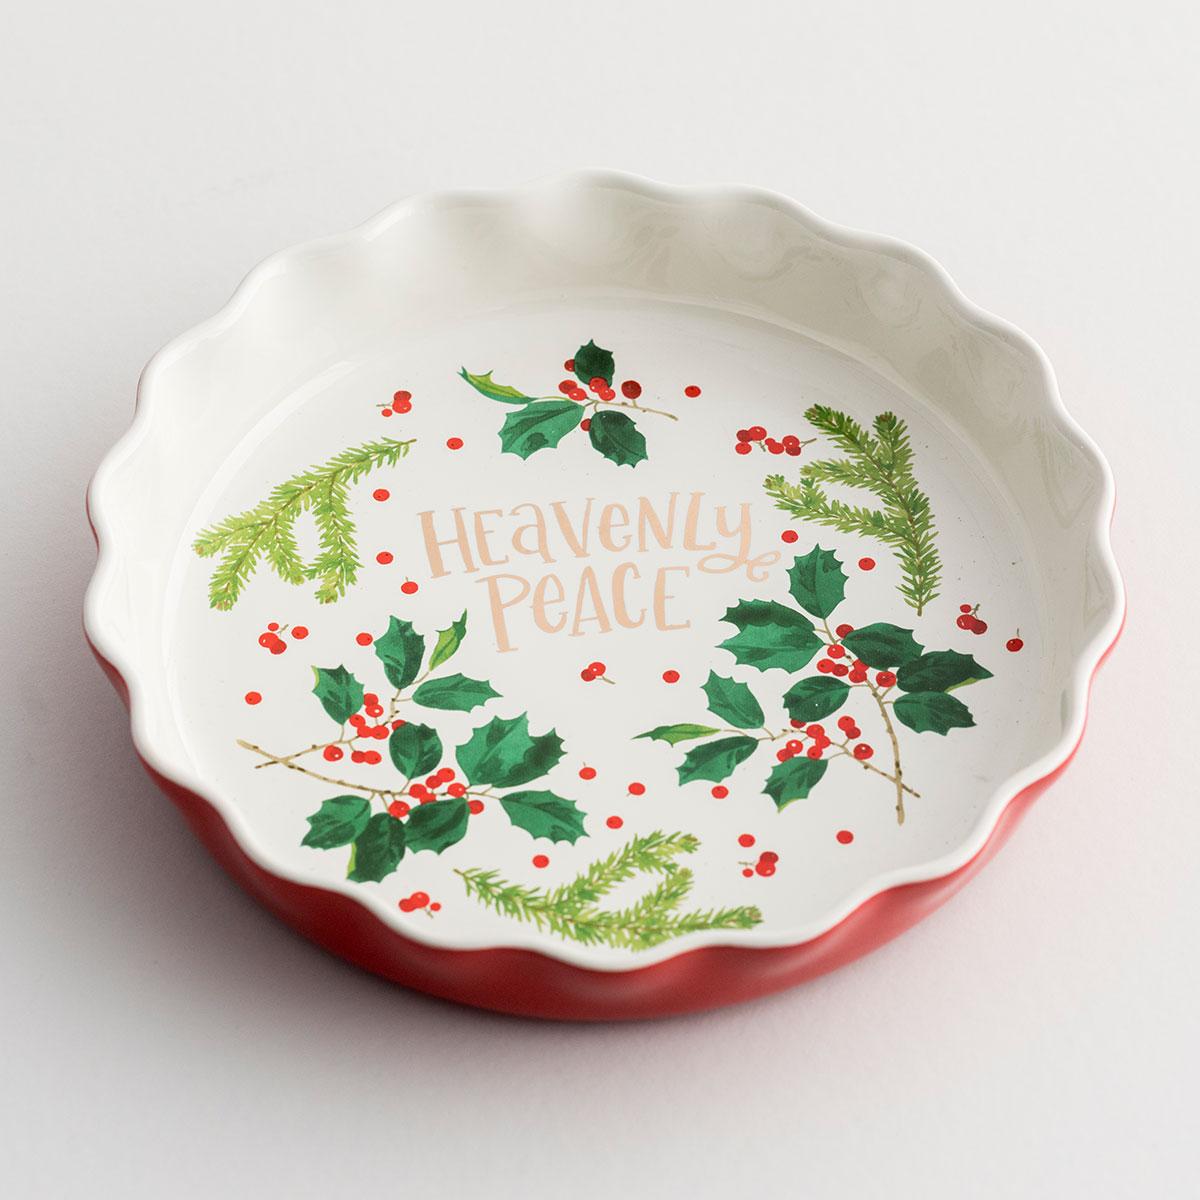 Heavenly Peace - Christmas Ceramic Pie Plate